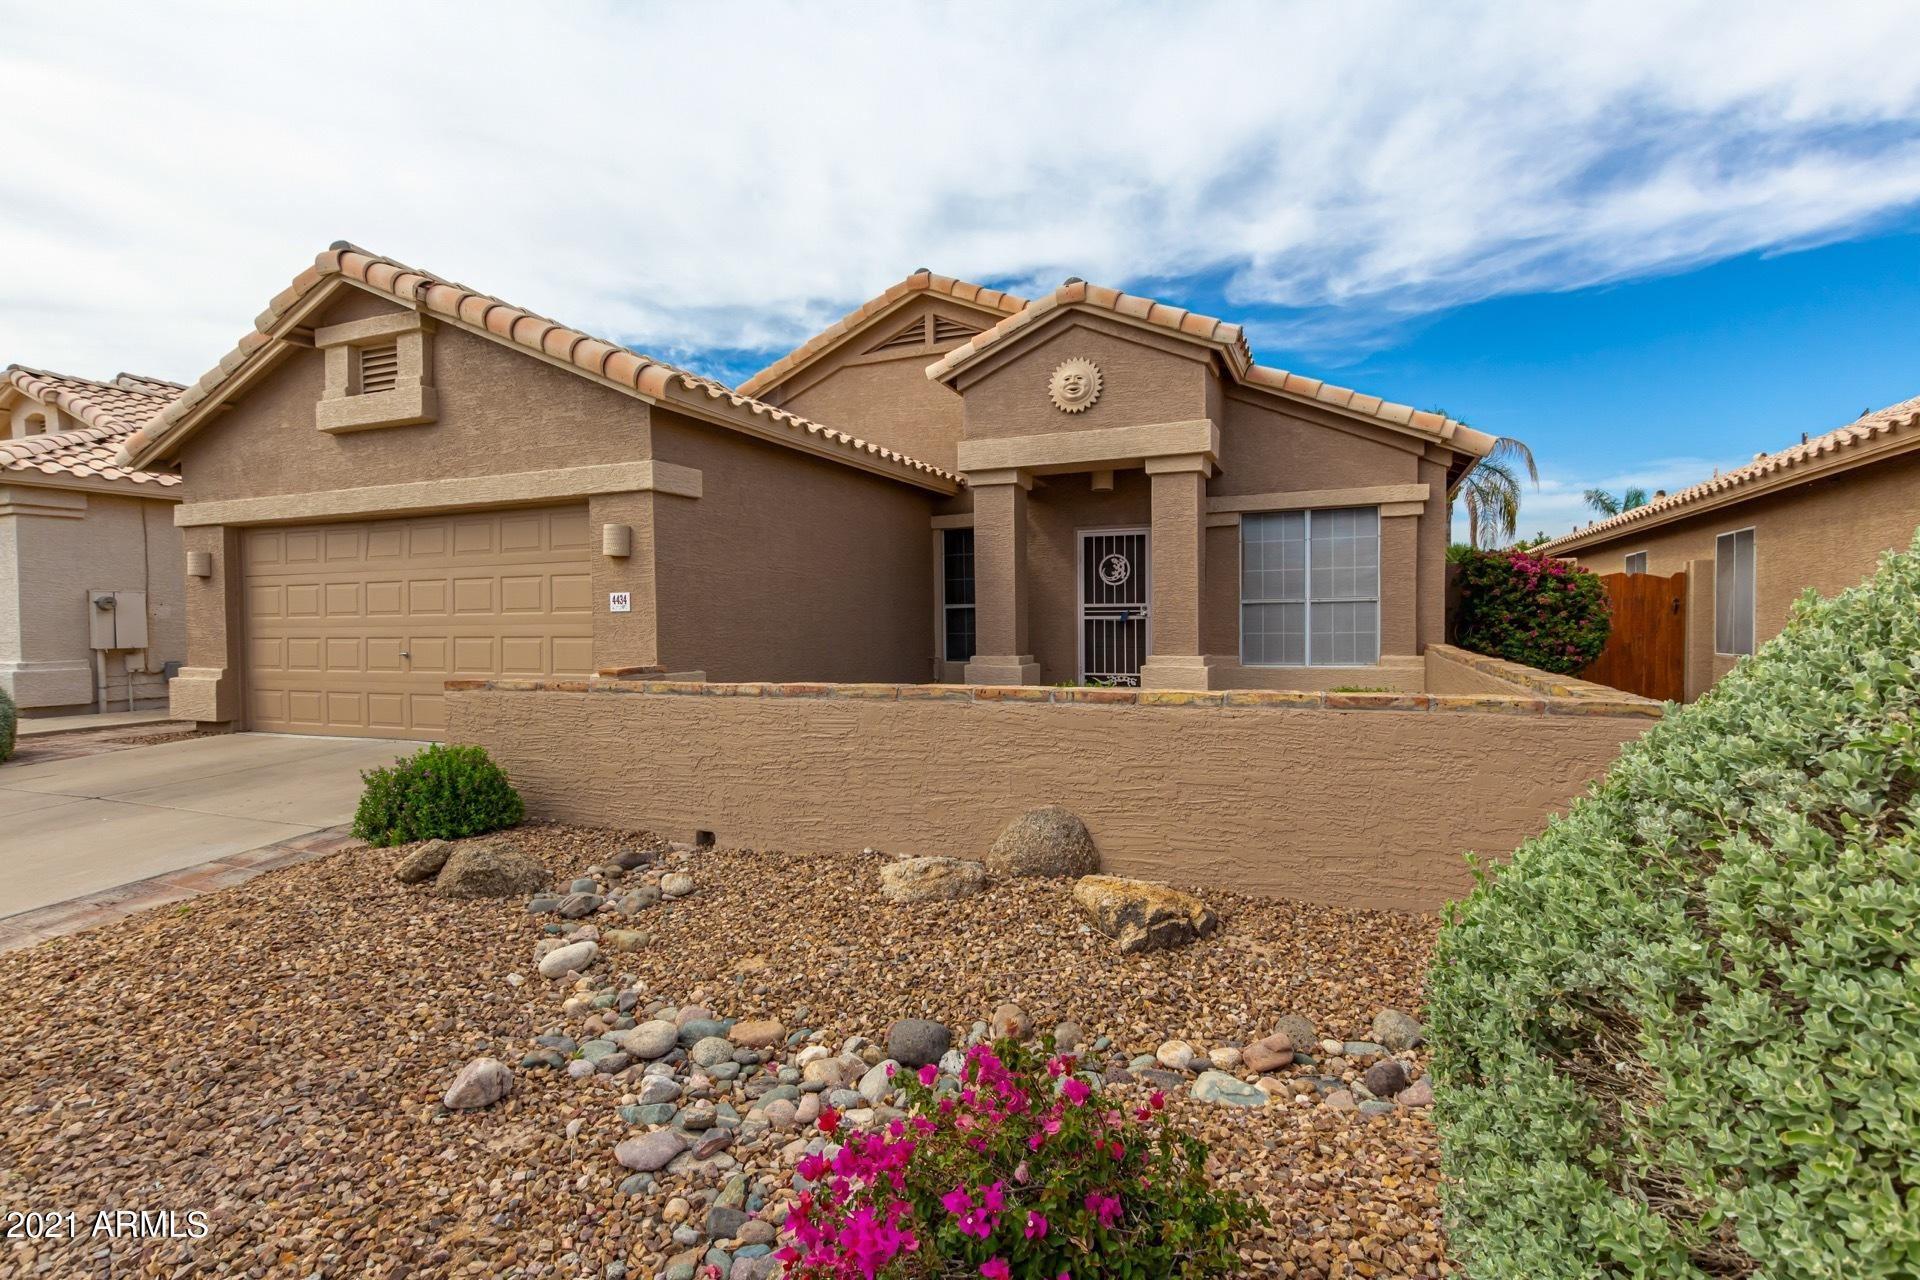 4434 E DESERT WIND Drive, Phoenix, AZ 85044 - MLS#: 6230344